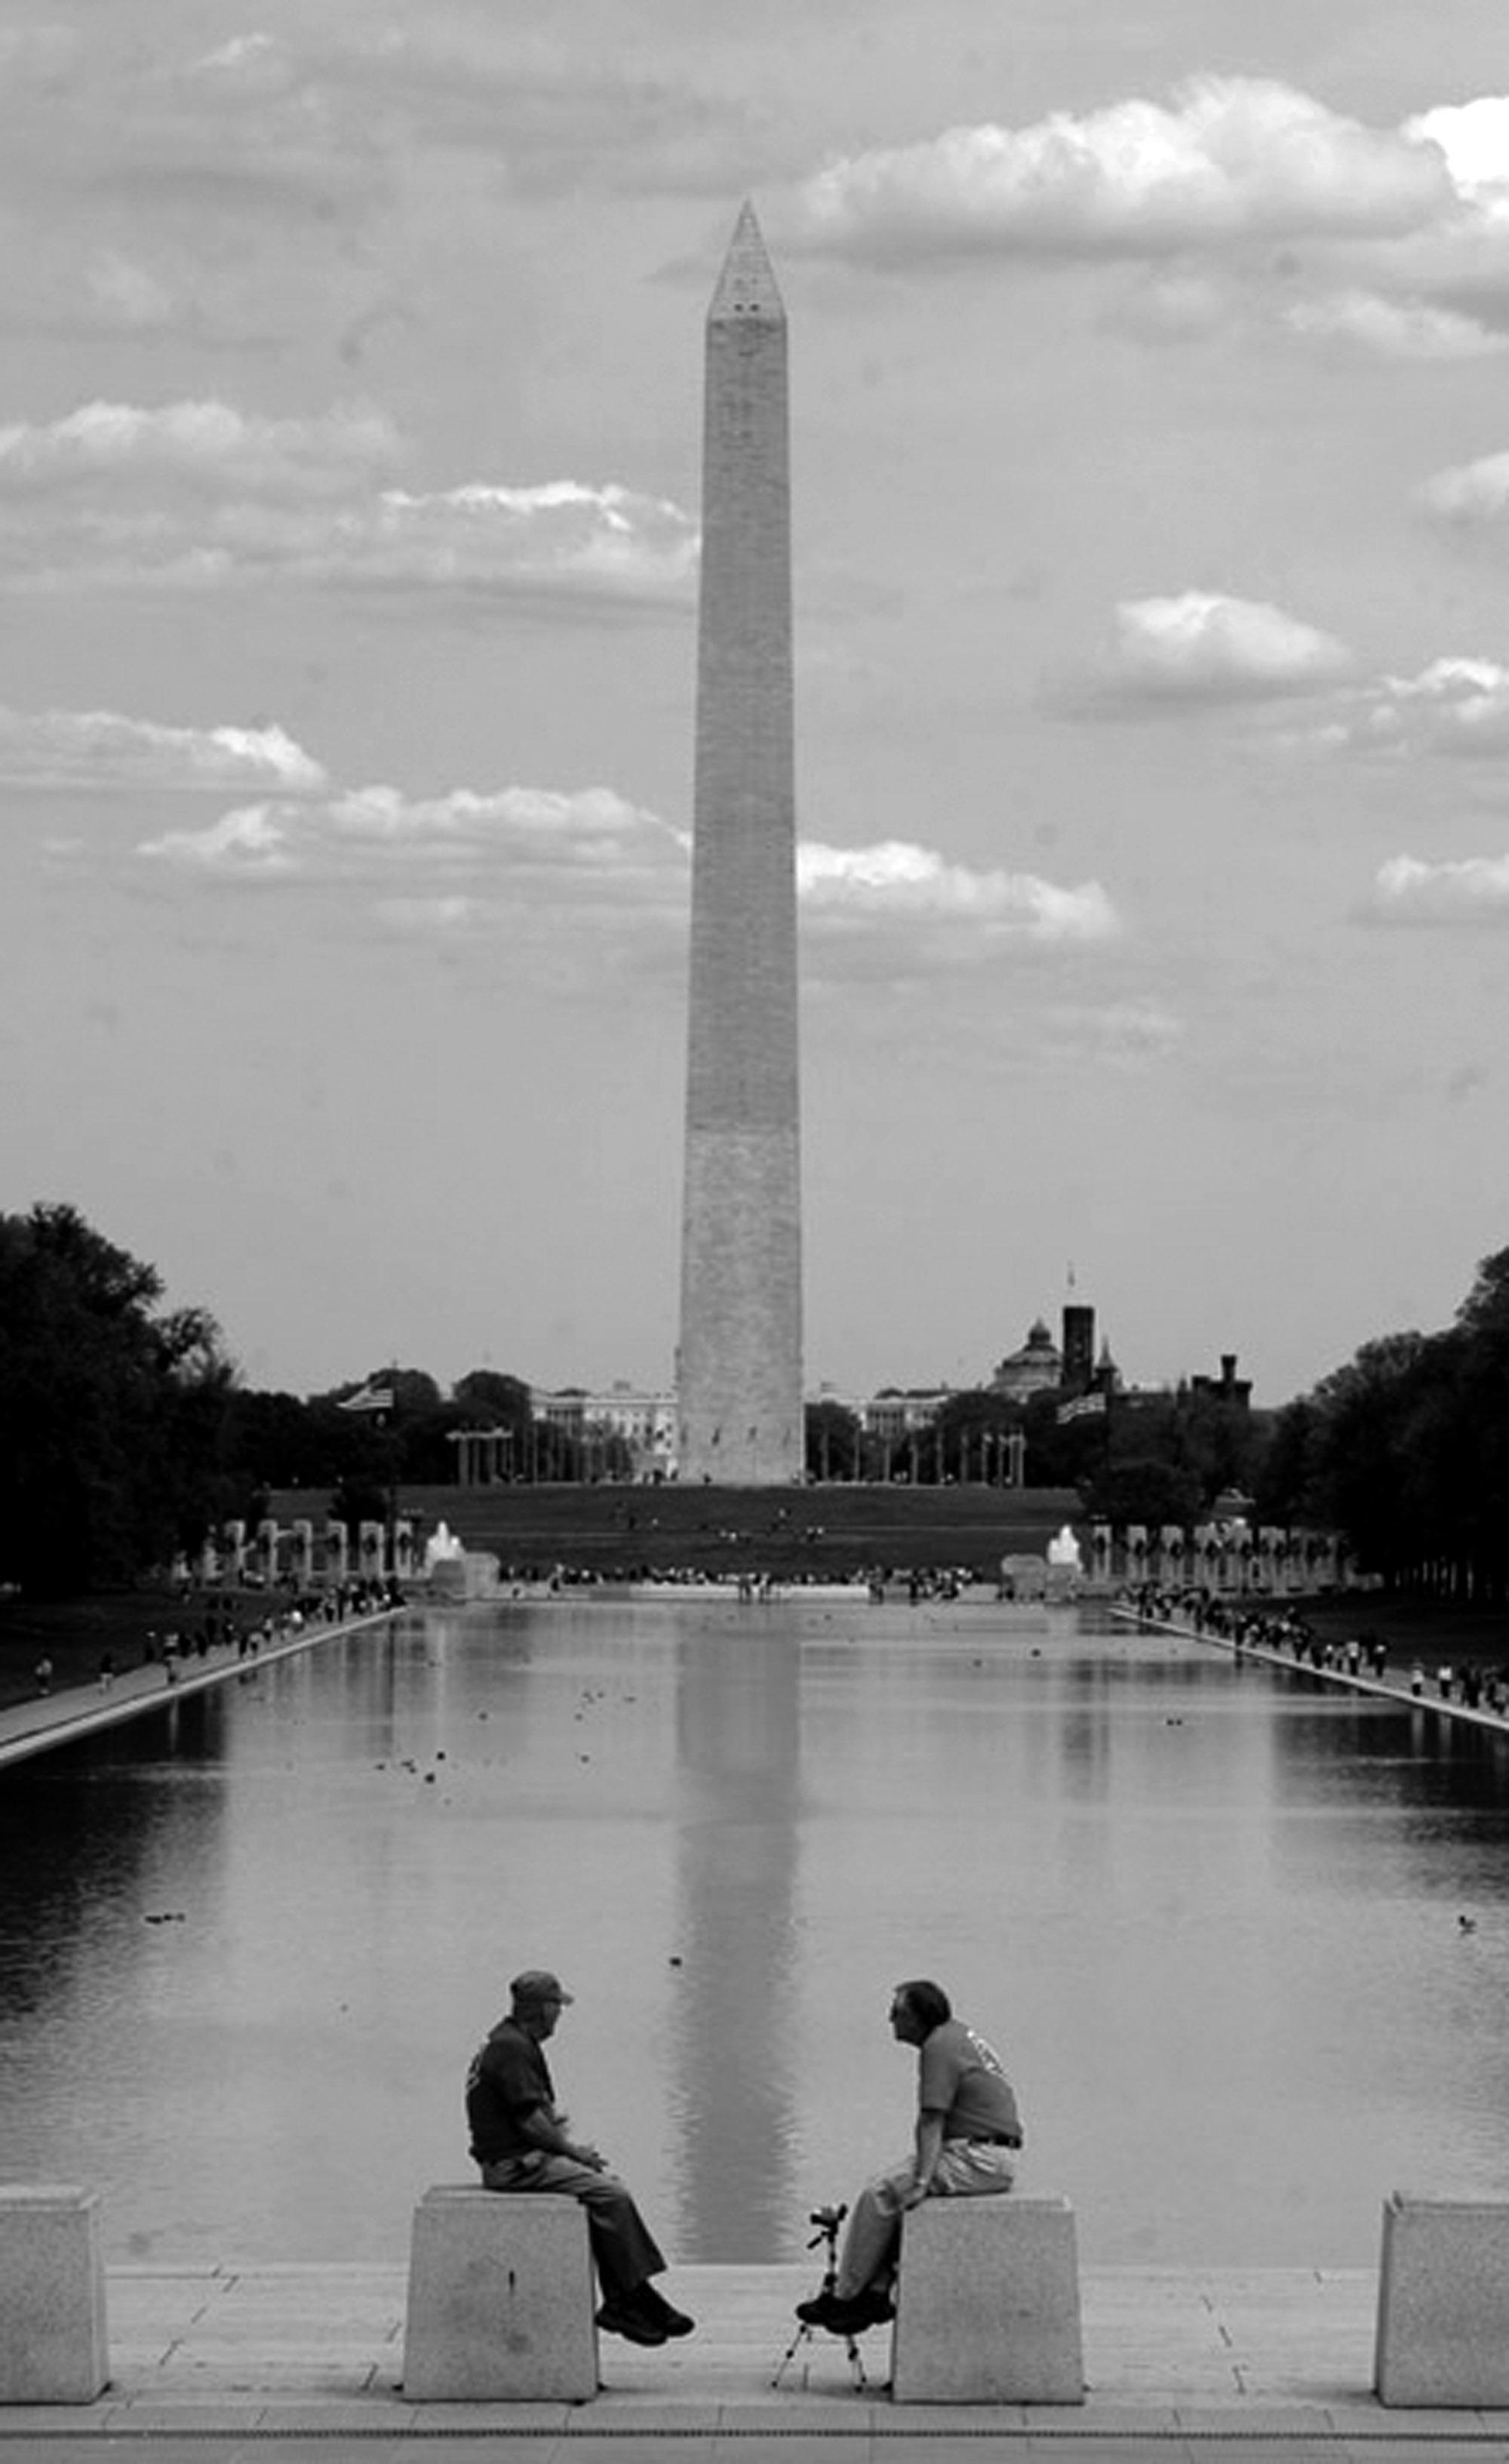 A veteran and his volunteer take a short break near the Washington Monument.